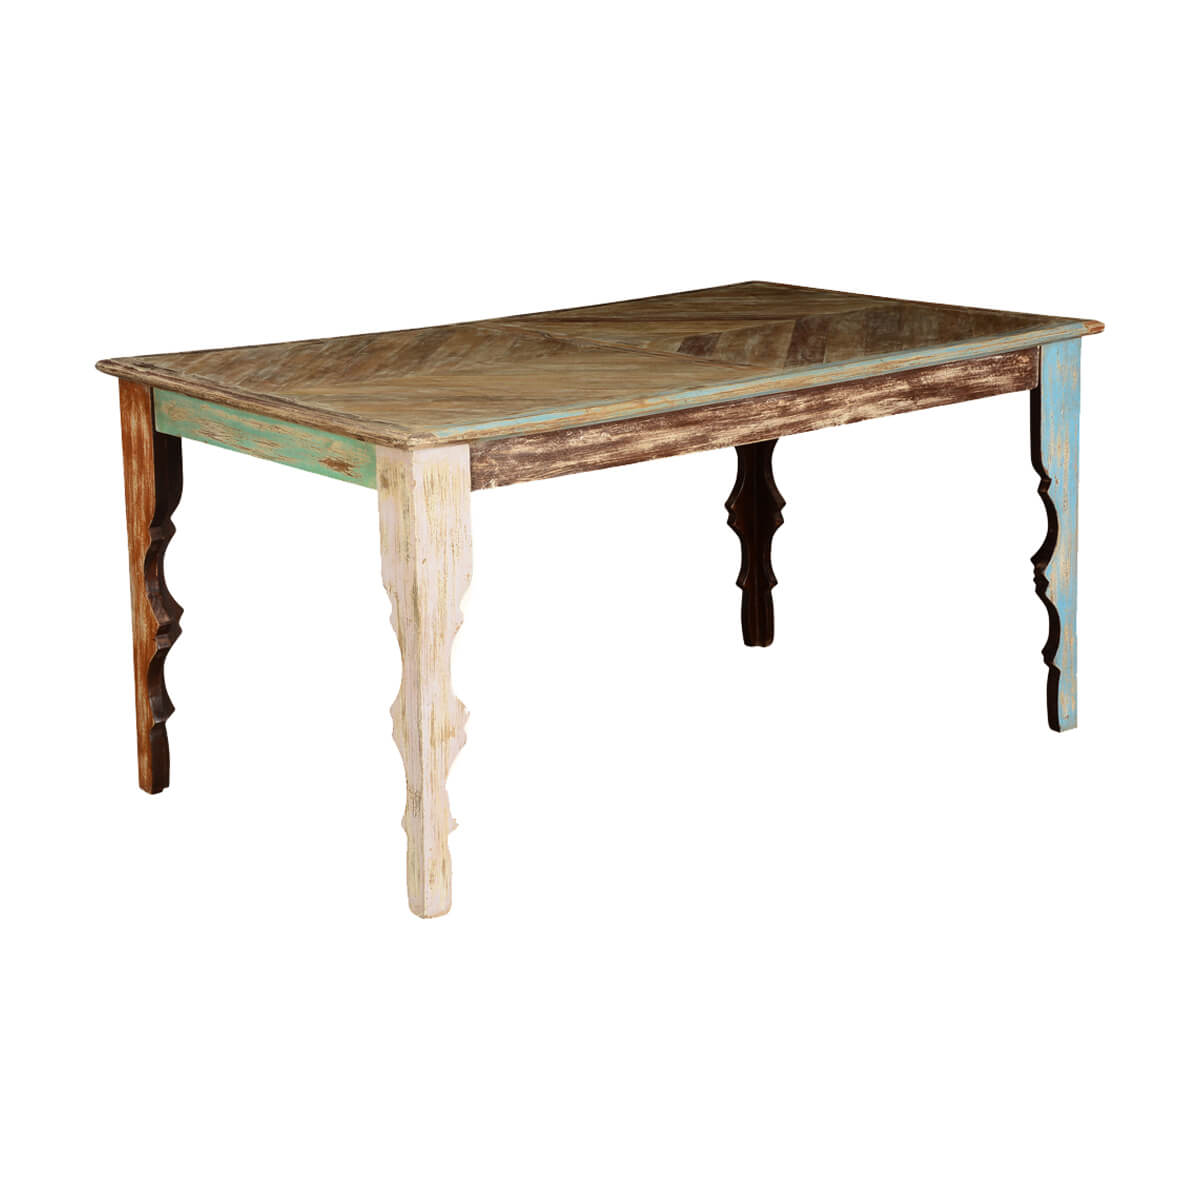 rustic parquet diamond mango wood dining table. Black Bedroom Furniture Sets. Home Design Ideas